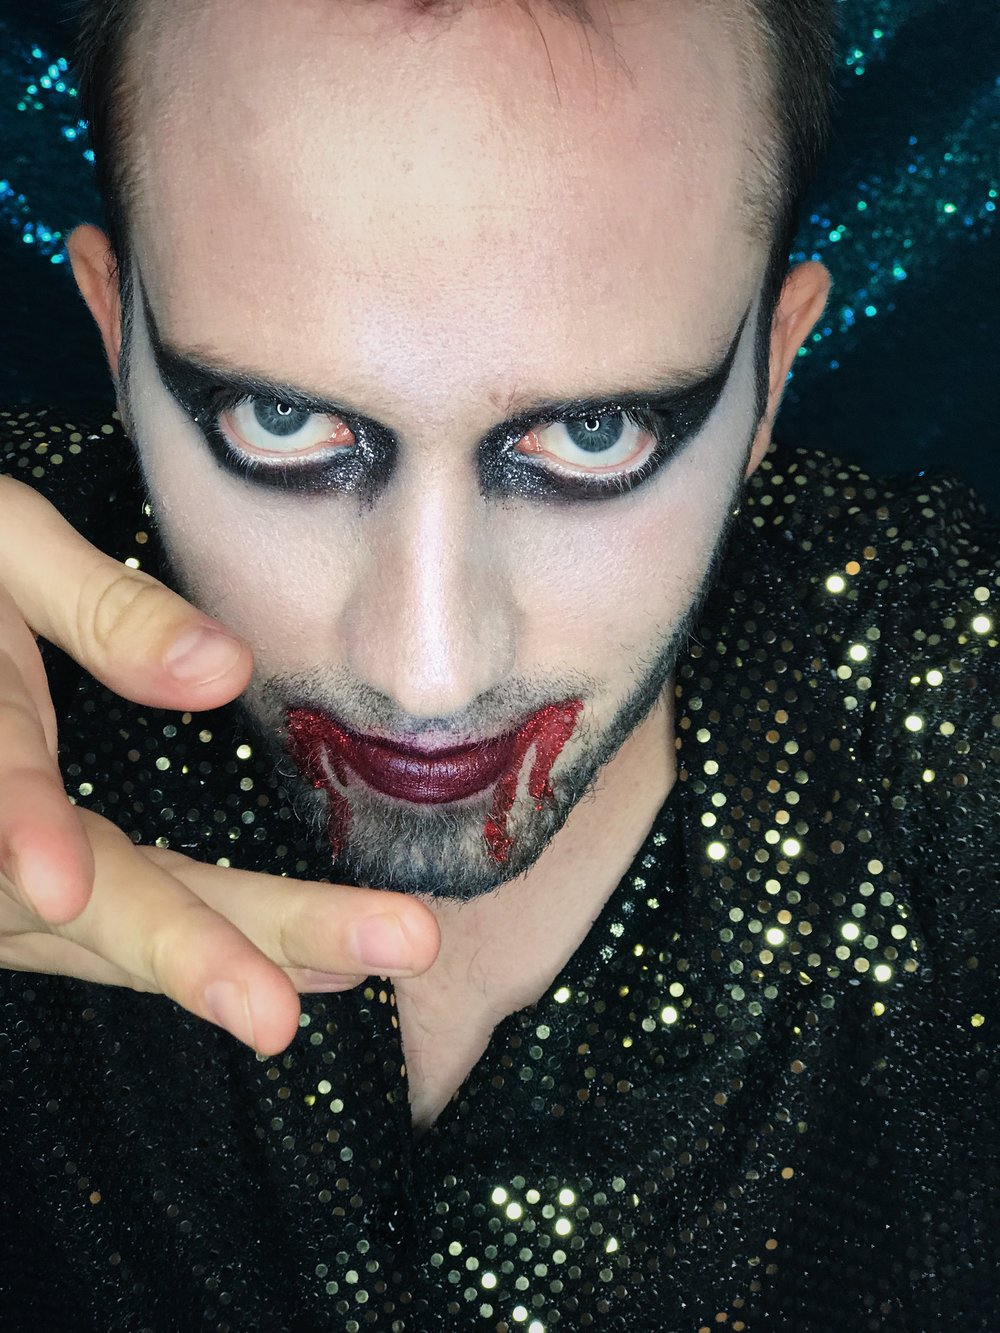 Biodegradable eco glitter vampire Halloween dress up make up inspiration Brighton 2018